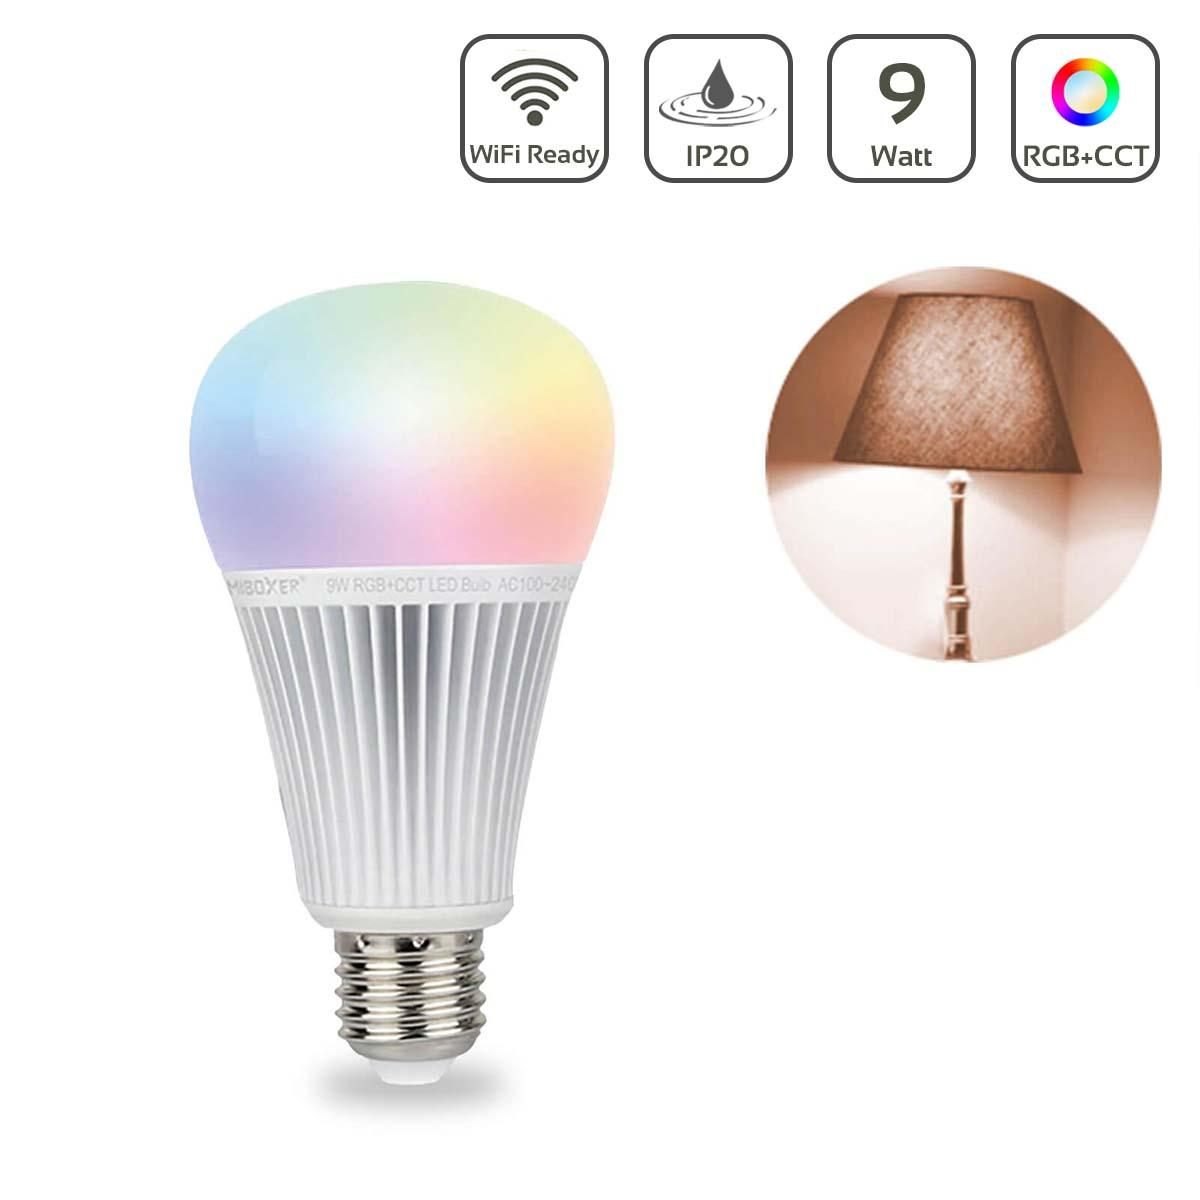 MiBoxer RGB+CCT Lampe 9W E27   2.4GHz WiFi ready   FUT012